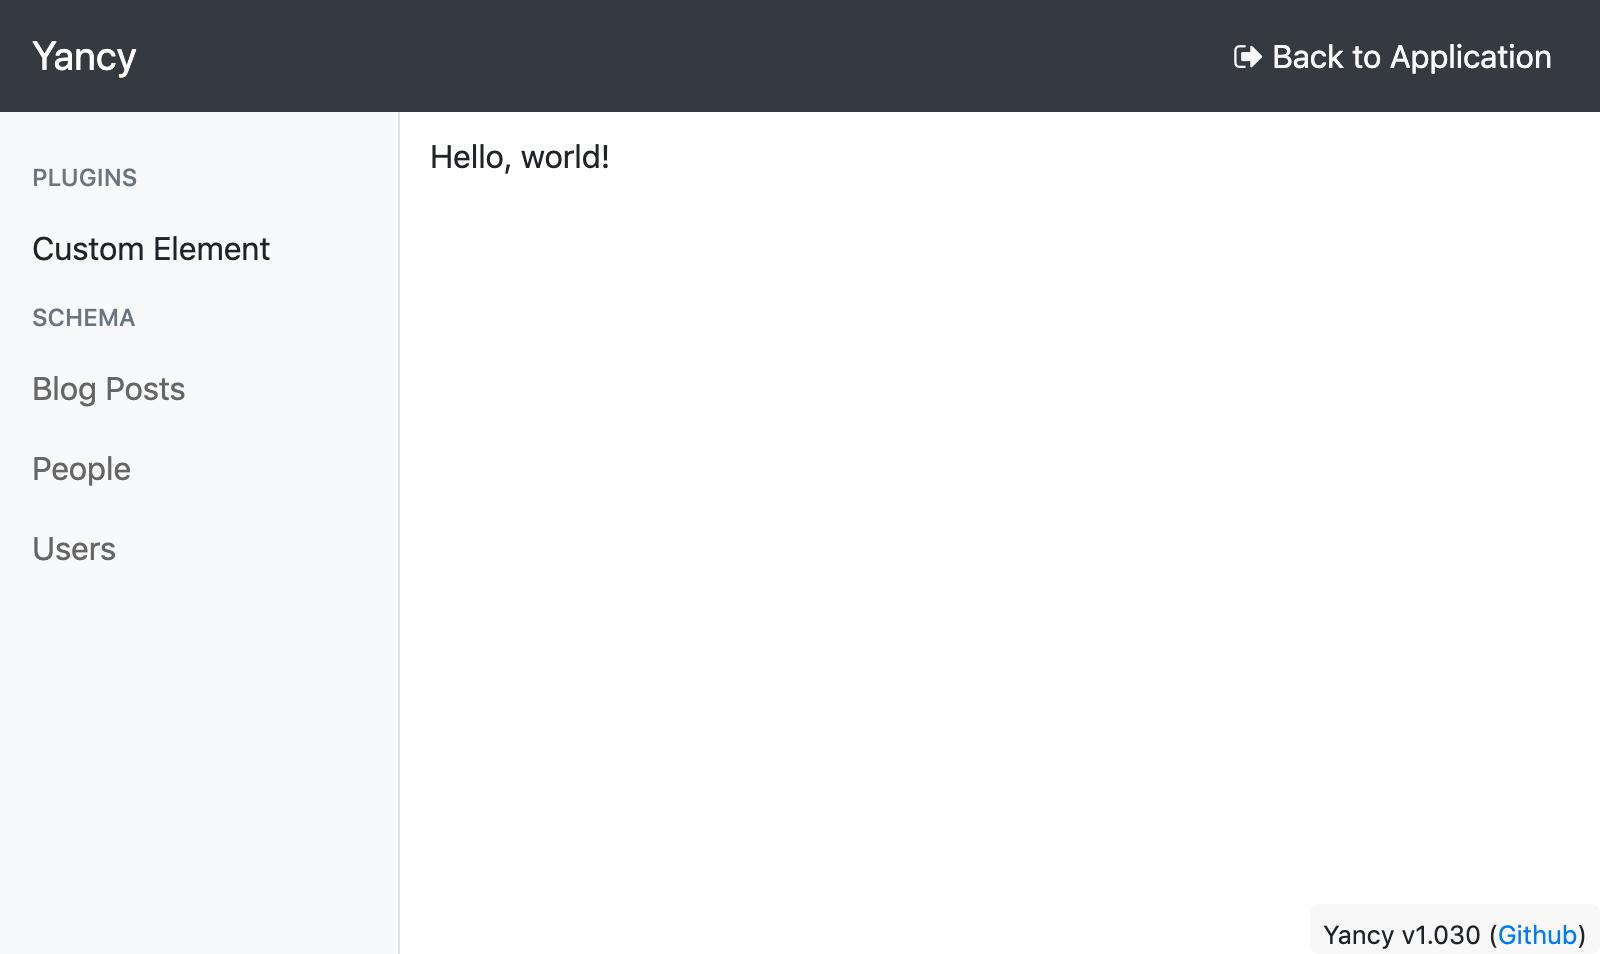 screenshot of yancy editor showing custom element